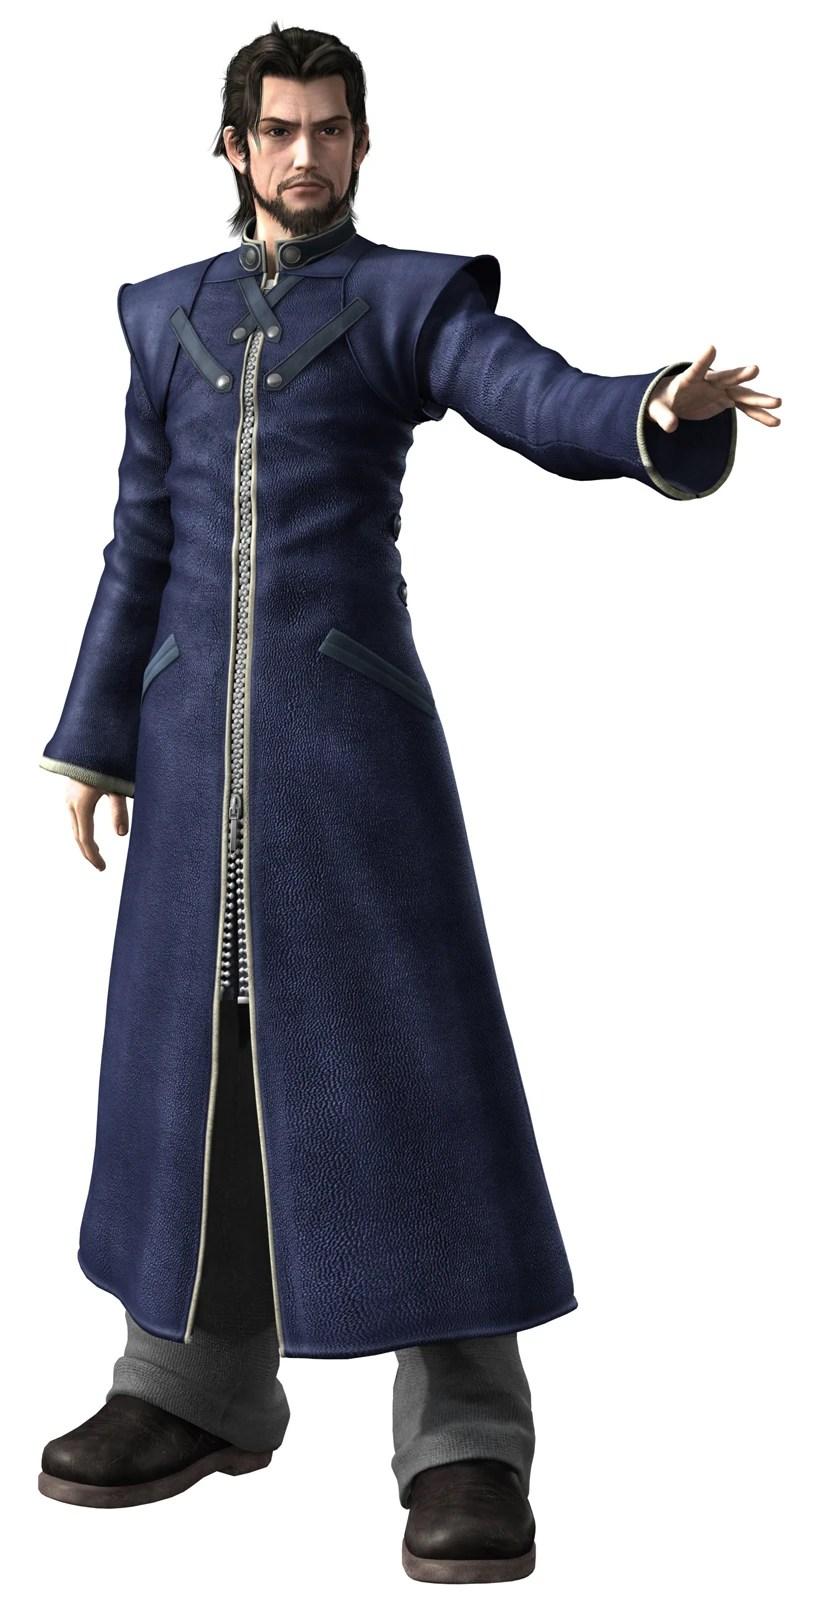 Reeve Tuesti The Final Fantasy Wiki 10 Years Of Having